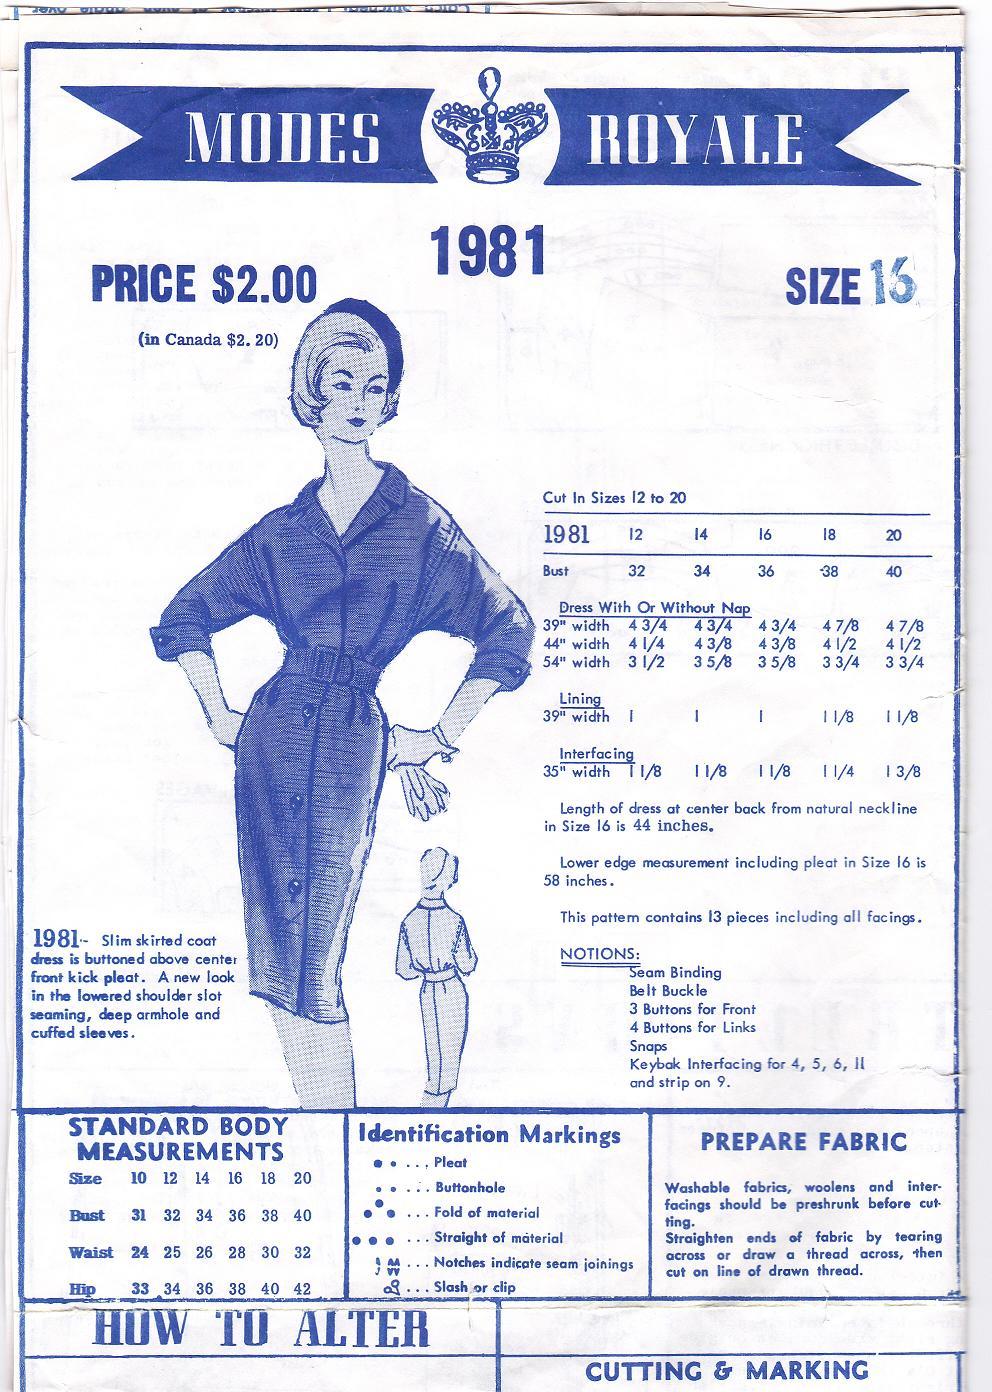 Modes Royale 1981